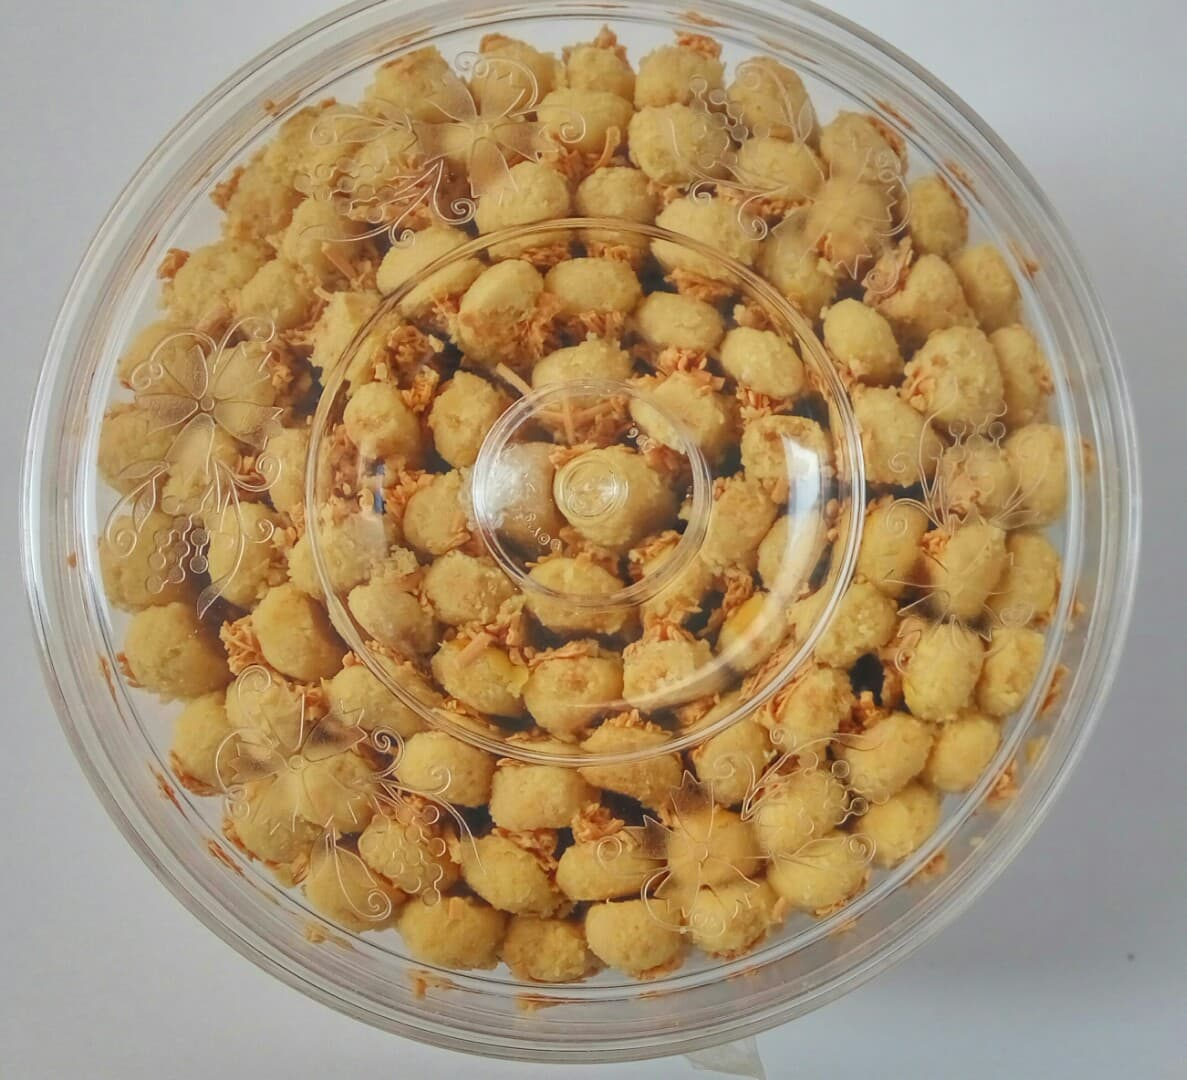 Jual Kastengel Keju Wisman Wijsman 500gr Mister Cookies Crunchy Nastar Edam Tokopedia